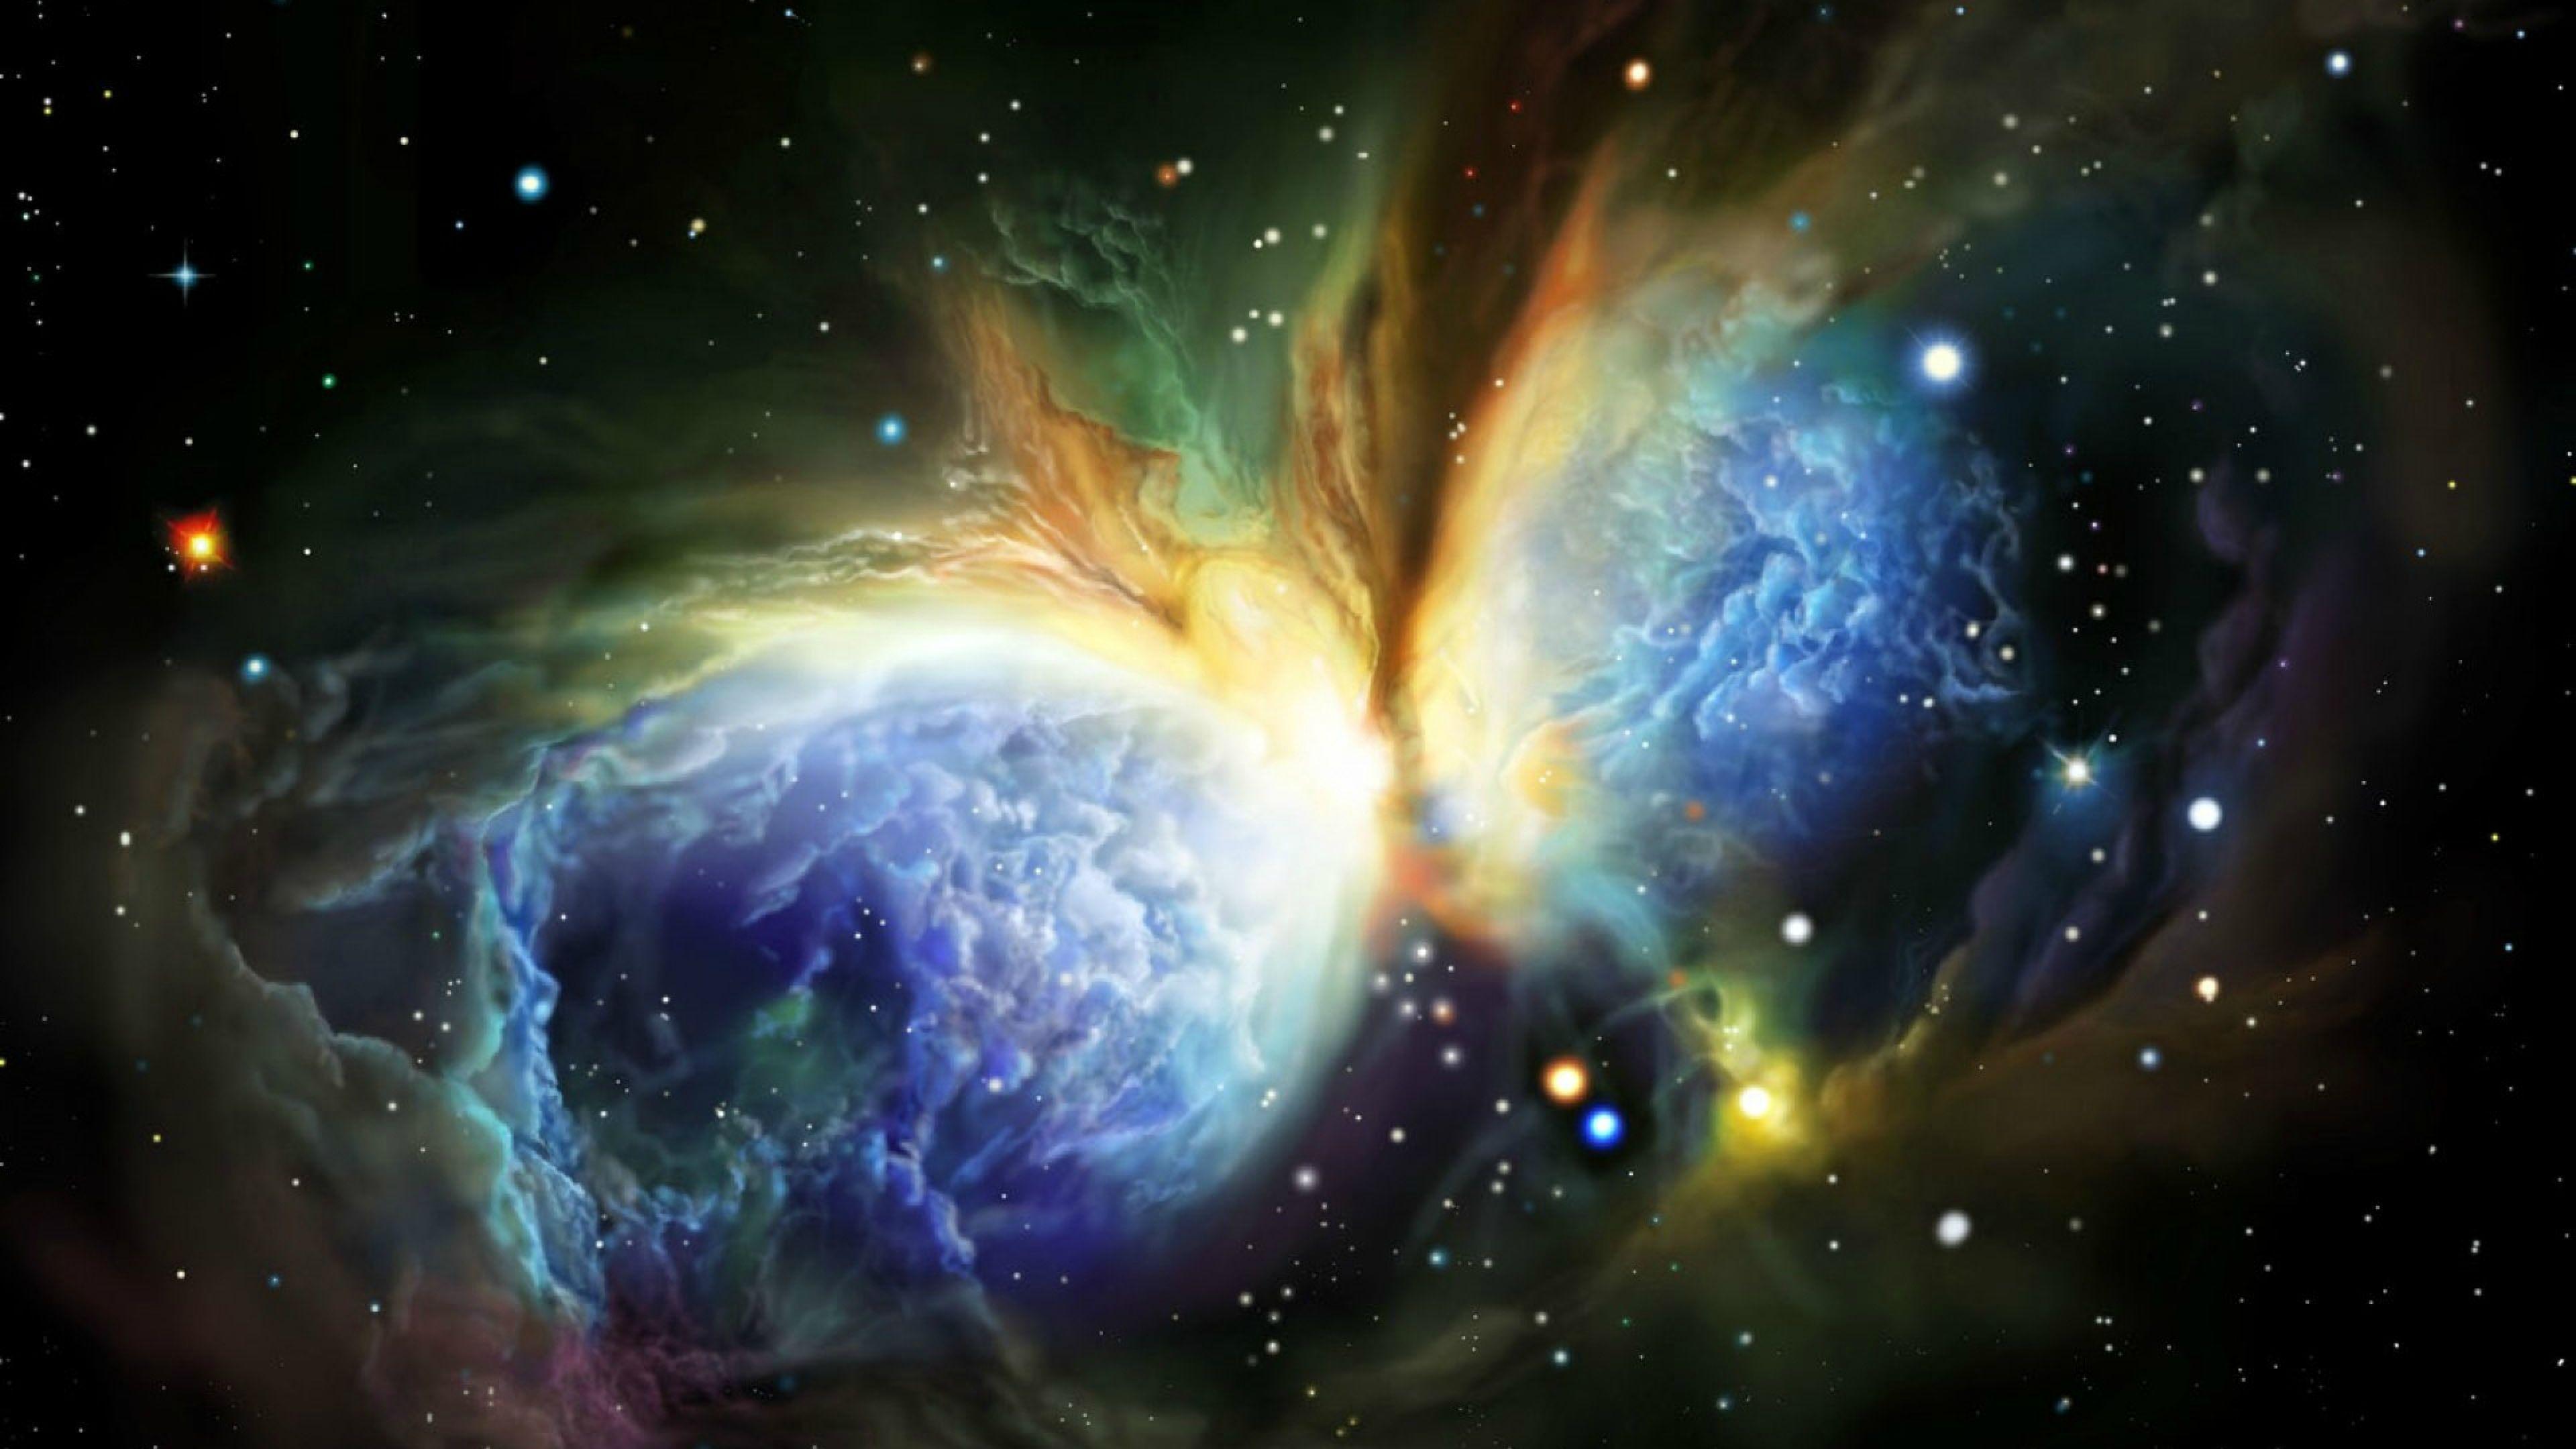 Amazing Space Wallpaper Sf Wallpaper